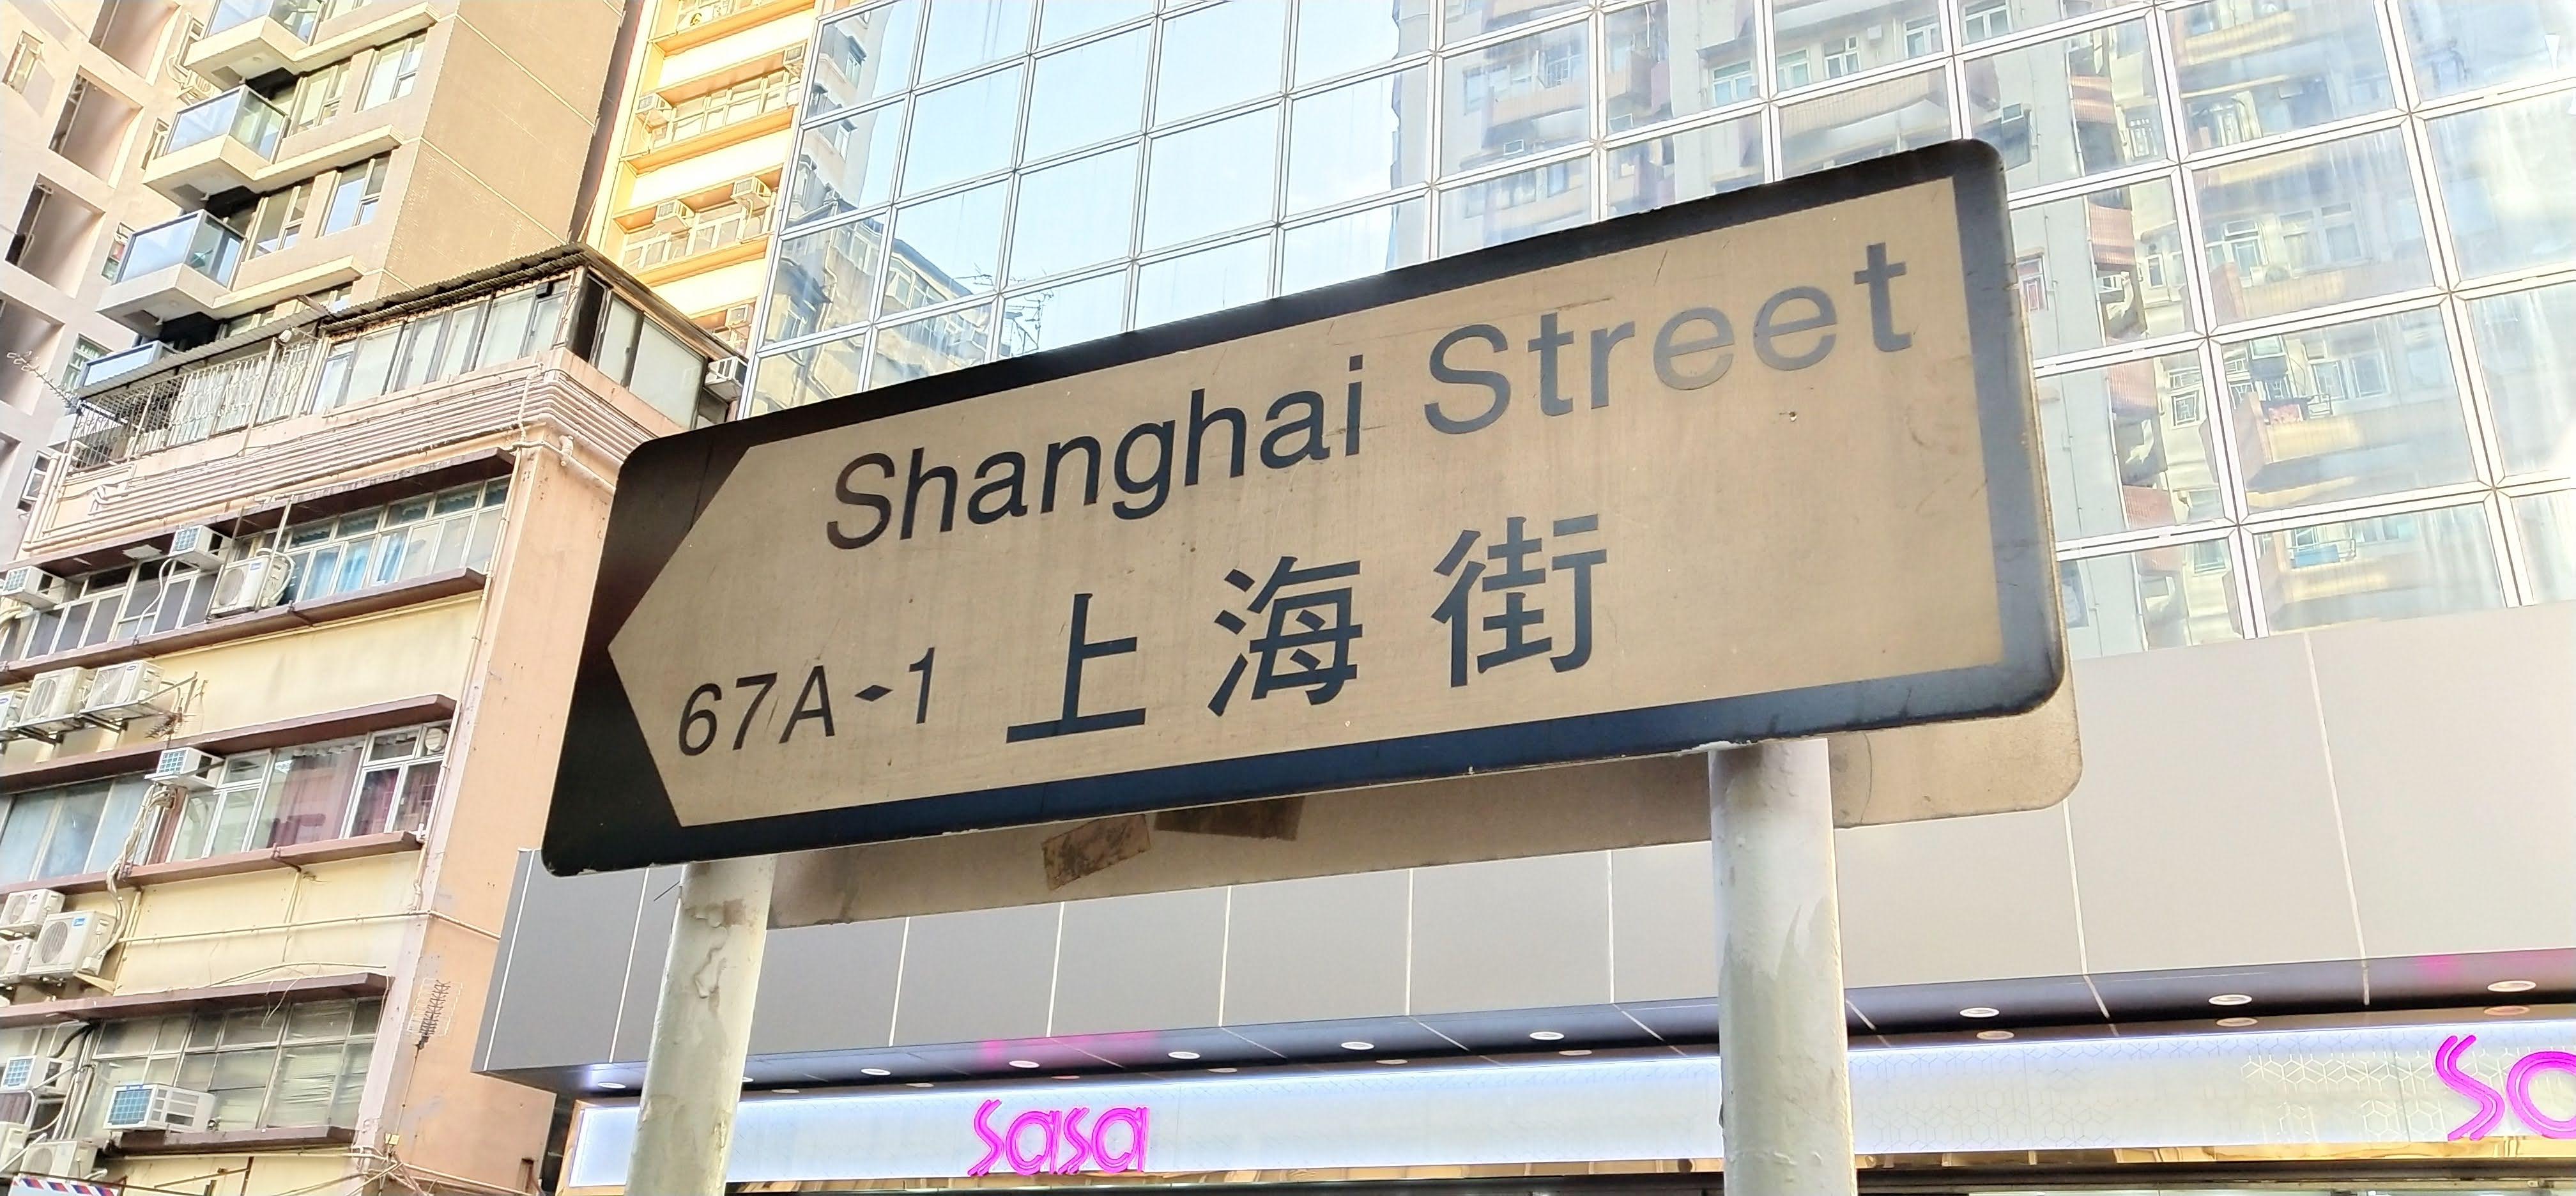 Shanghai Street name sign